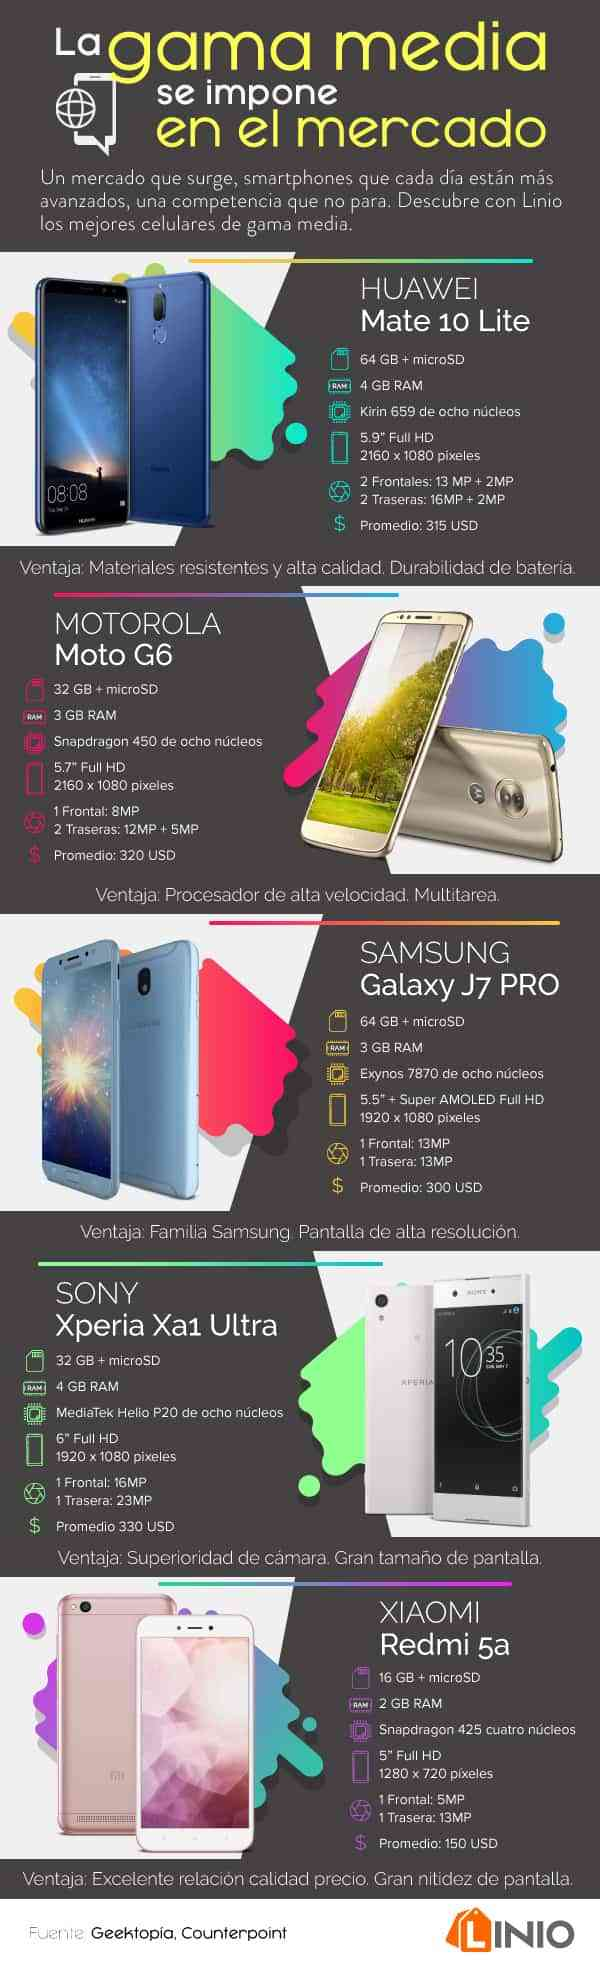 telefonos gama media latinoamerica